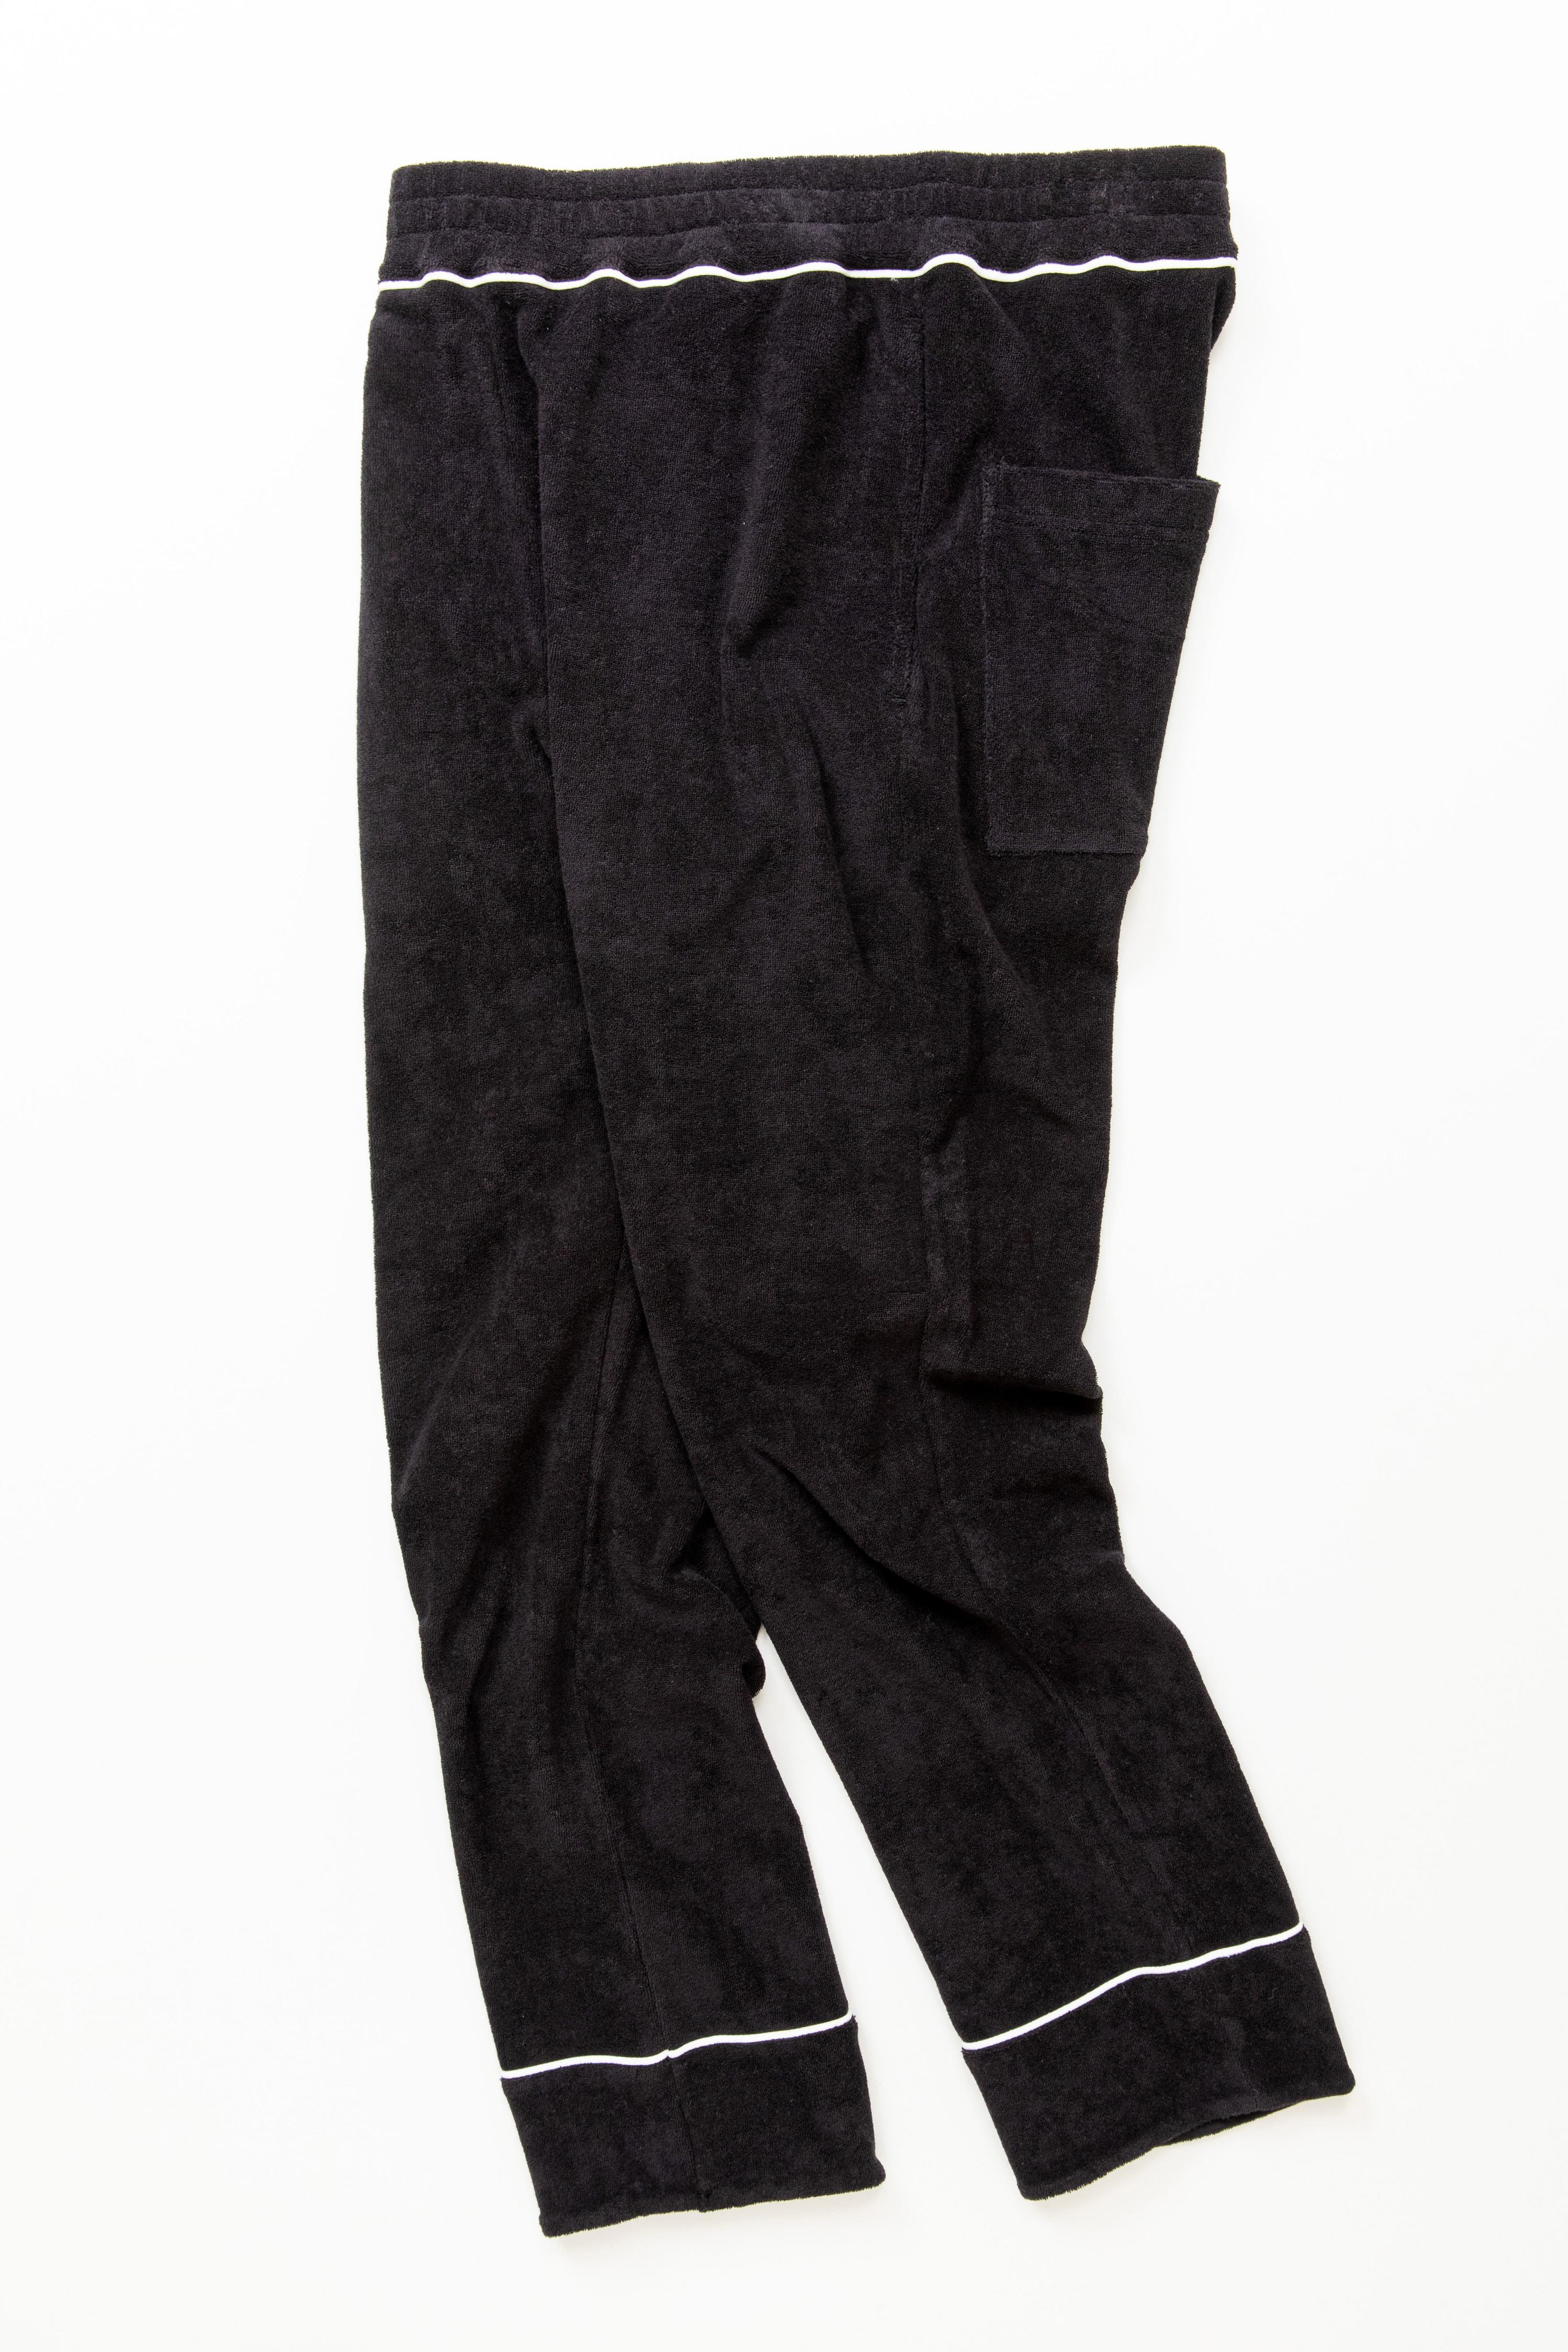 THING FABRICS TF Lose-fitting pants(Organic pilejersey)